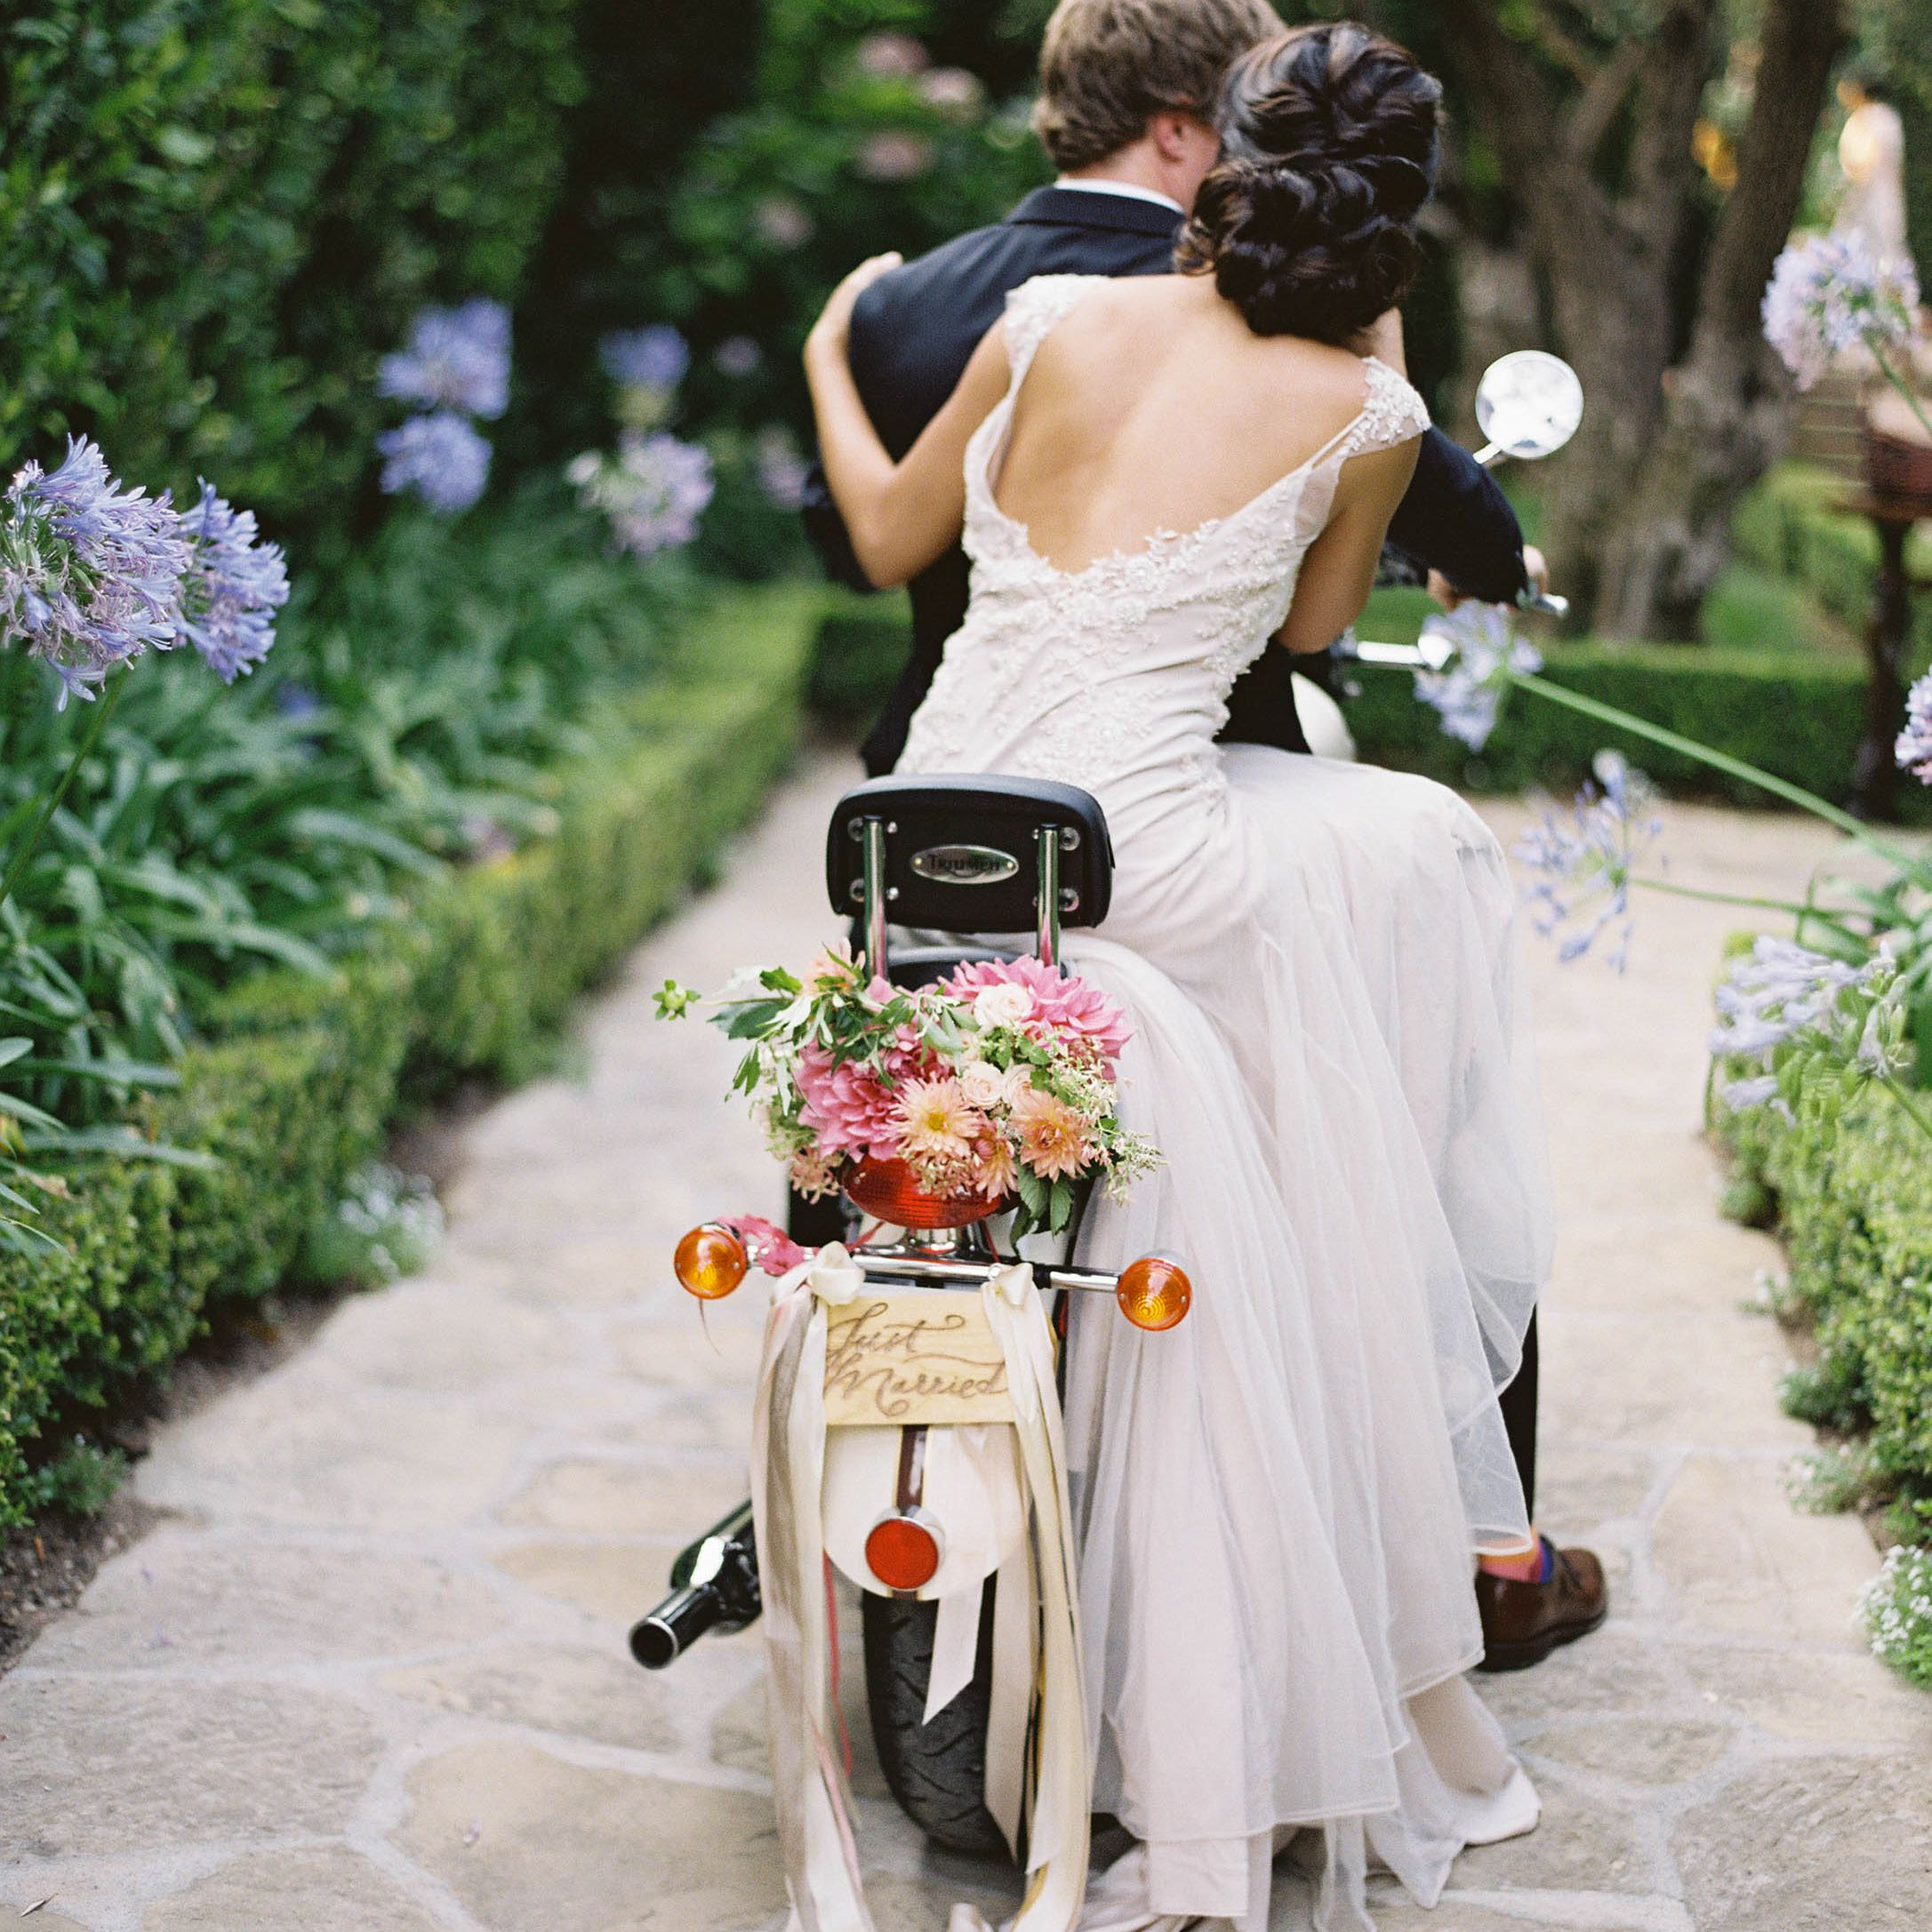 53 Genius Ways To Save Money On Your Wedding